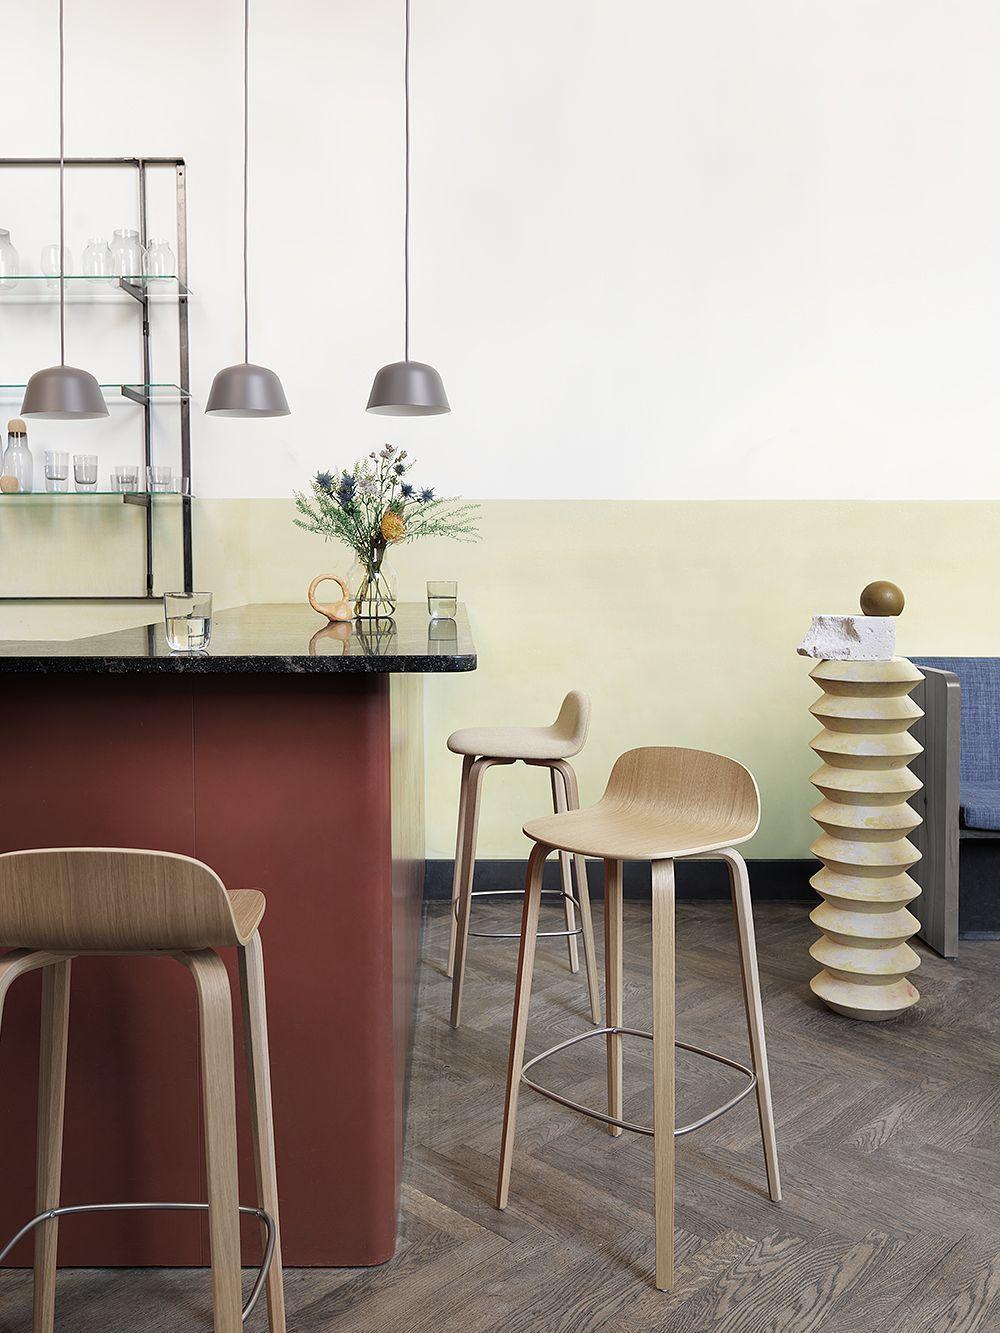 Custom Barstool By Woodvisions Inc Custommade Com Farmhouse Chairs Wooden Bar Stools Diy Bar Stools